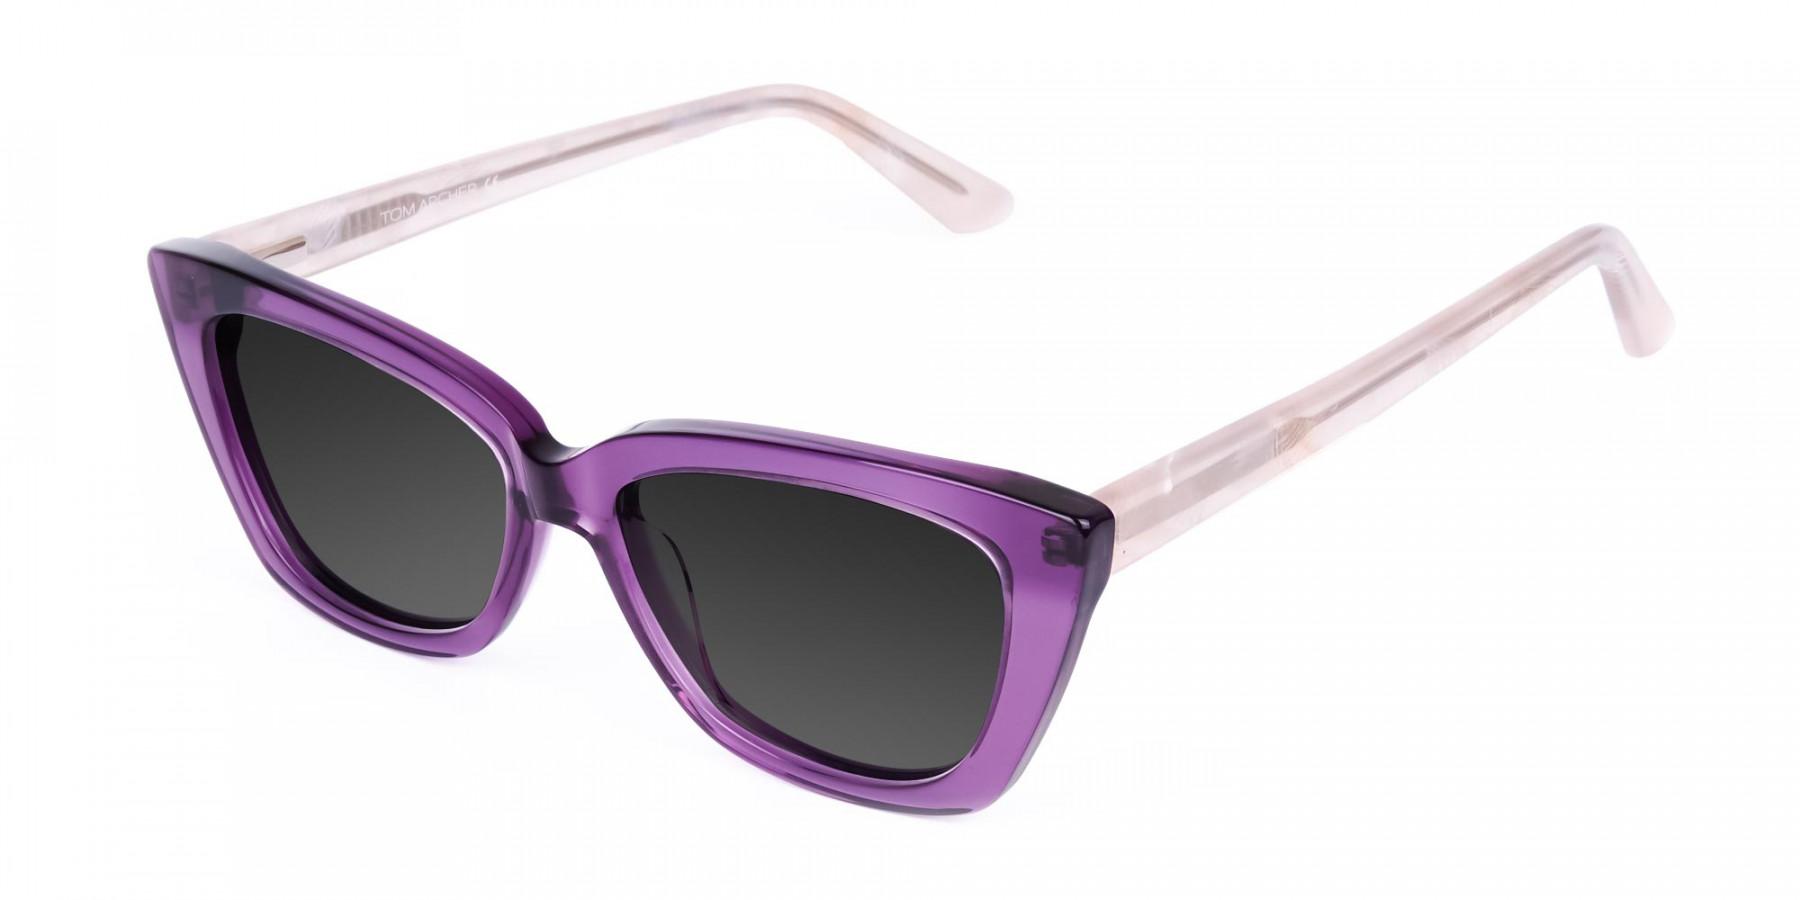 Purple-Cat-Eye-Sunglasses-in-Grey-Tint-3